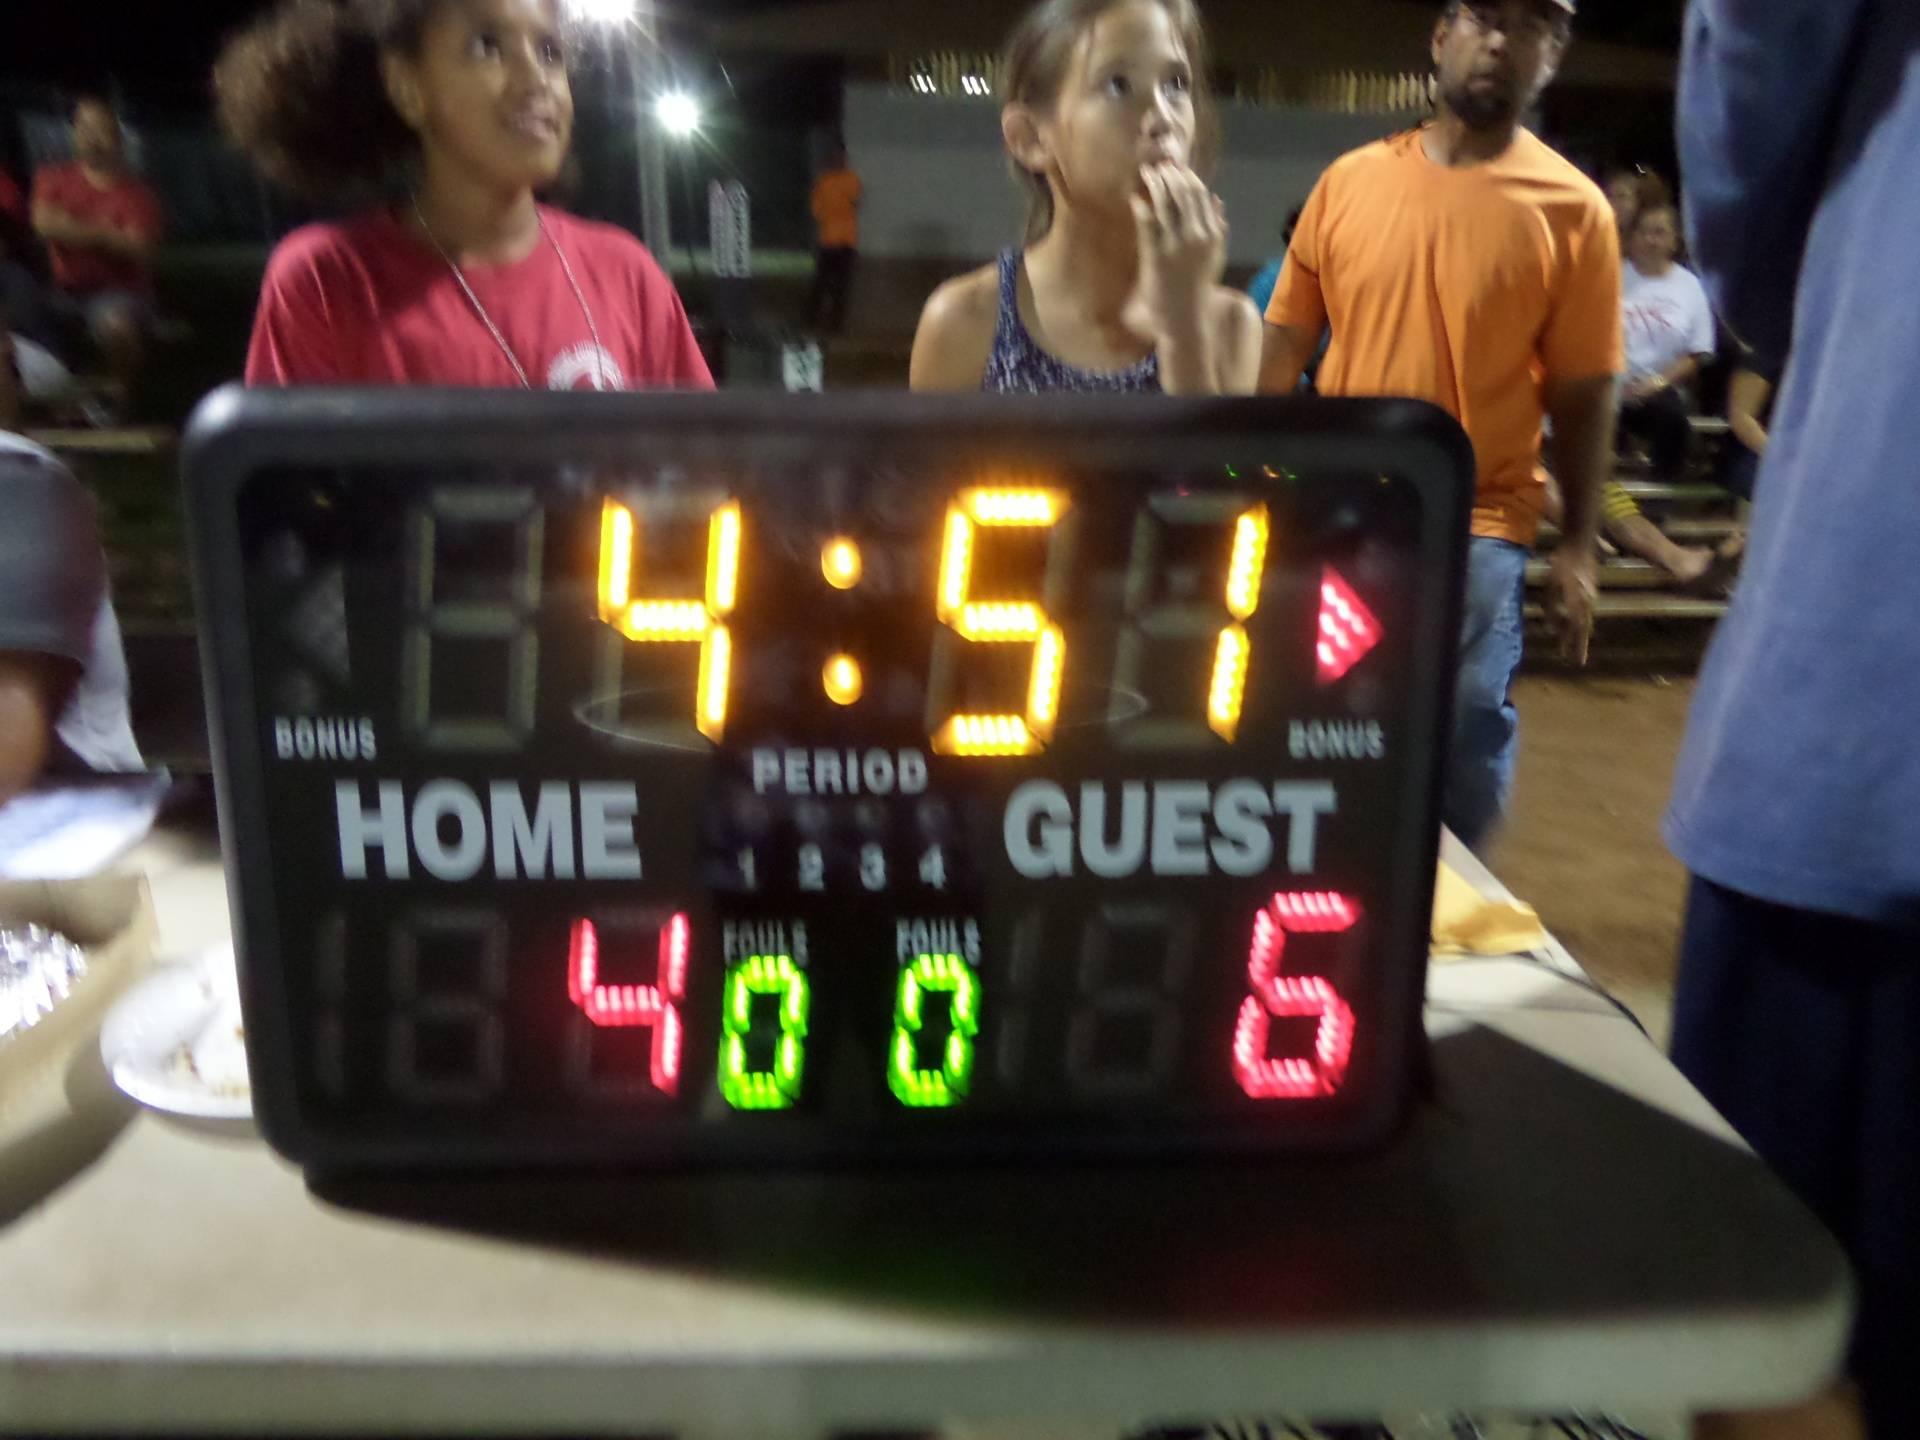 2nd quarter championship